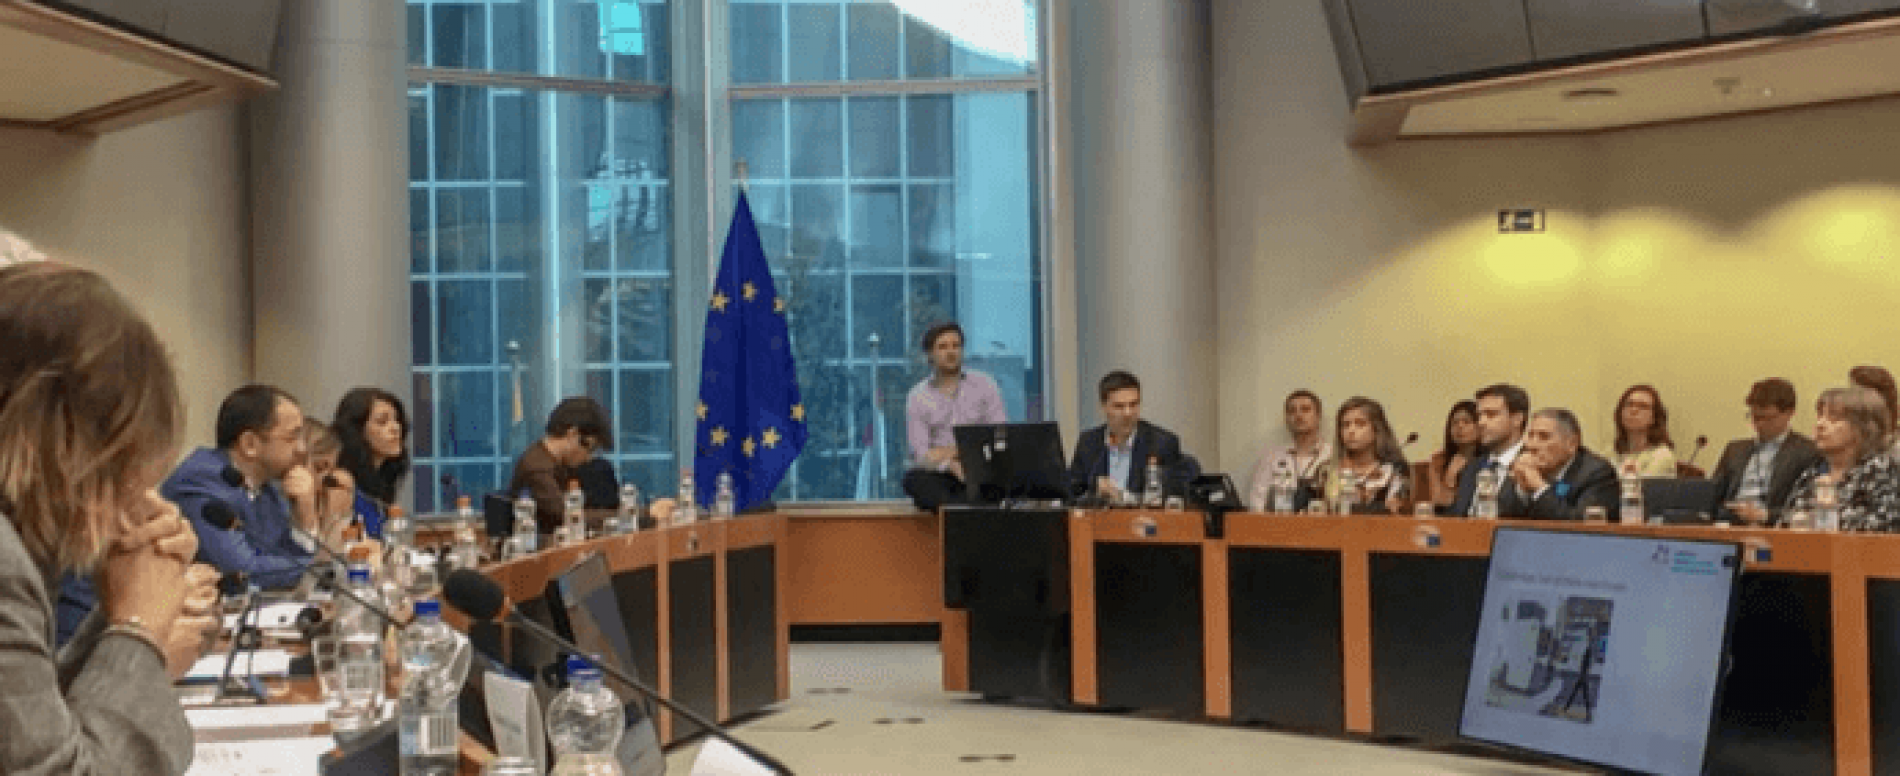 Direttiva plastica. Al MEP, EVA,  industriali e eurodeputati italiani a difesa del settore